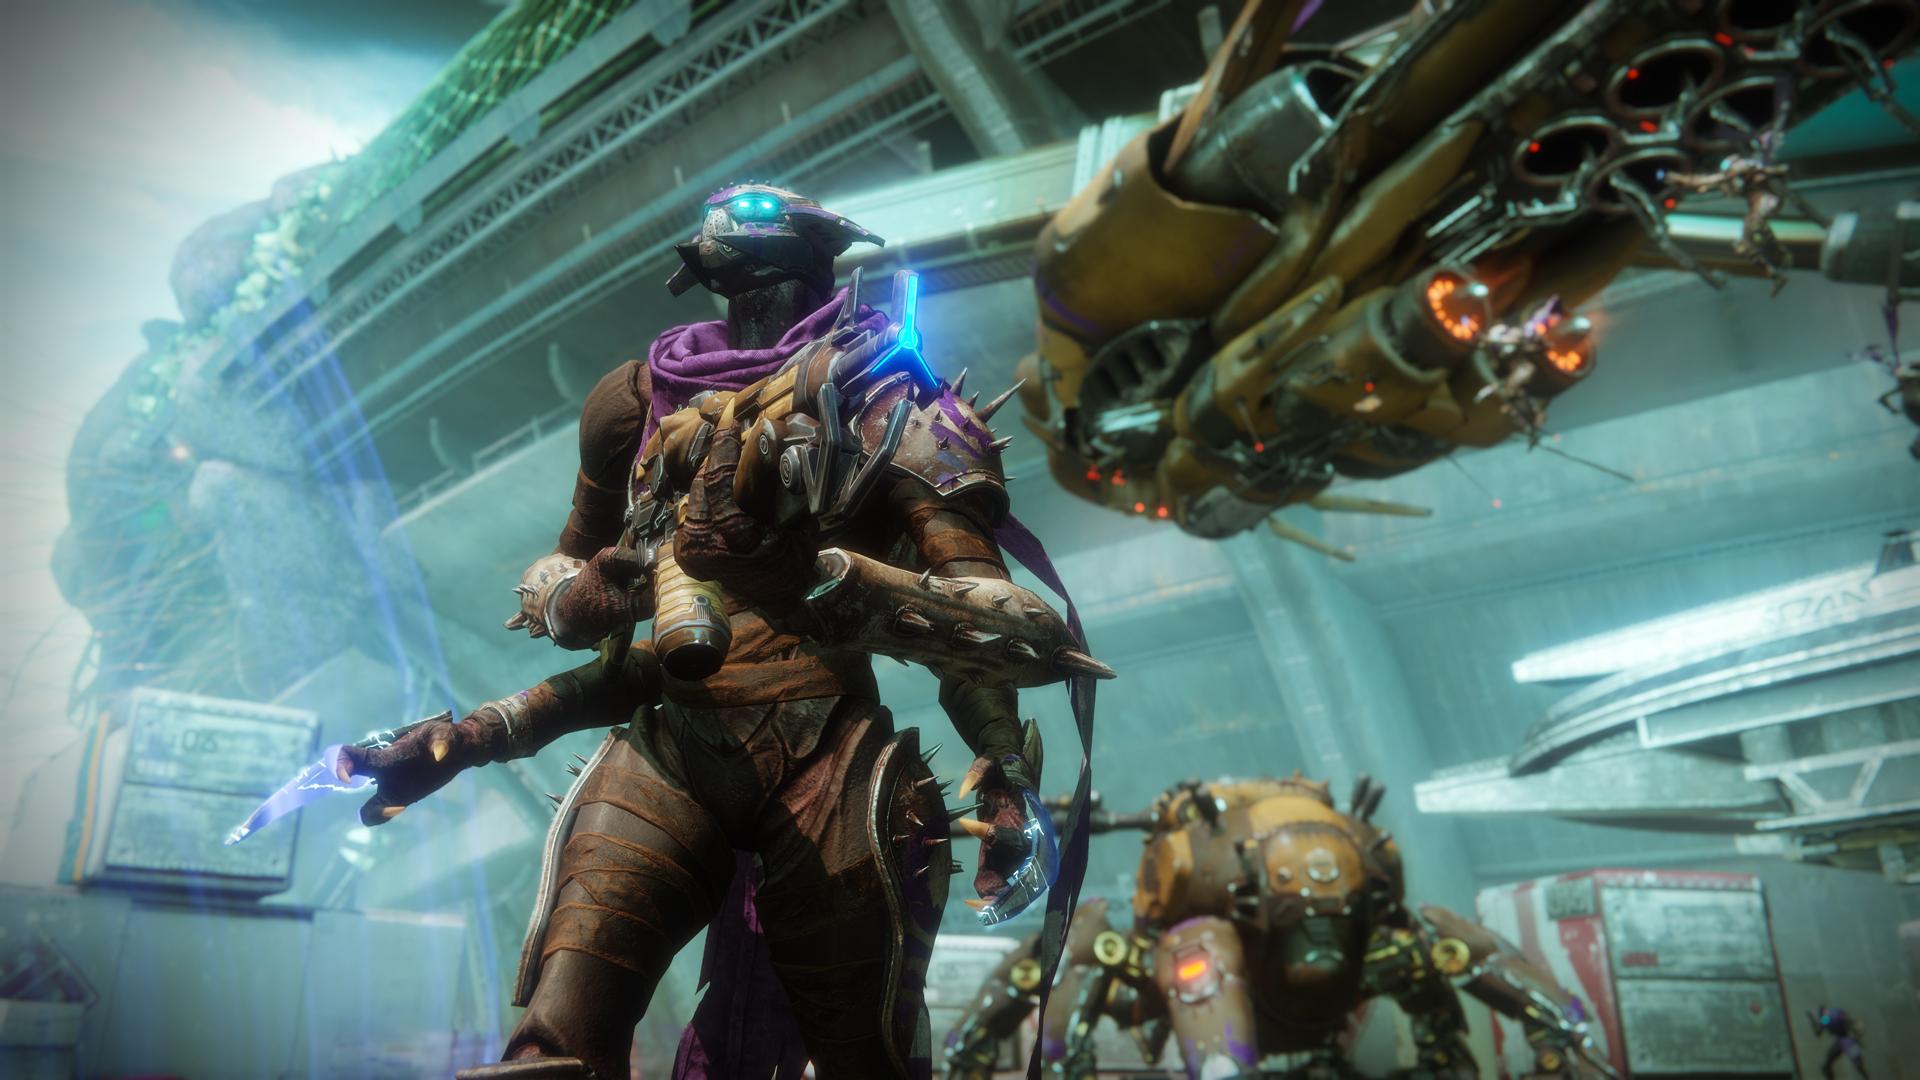 Destiny 2 is down, Bungie investigating stork errors